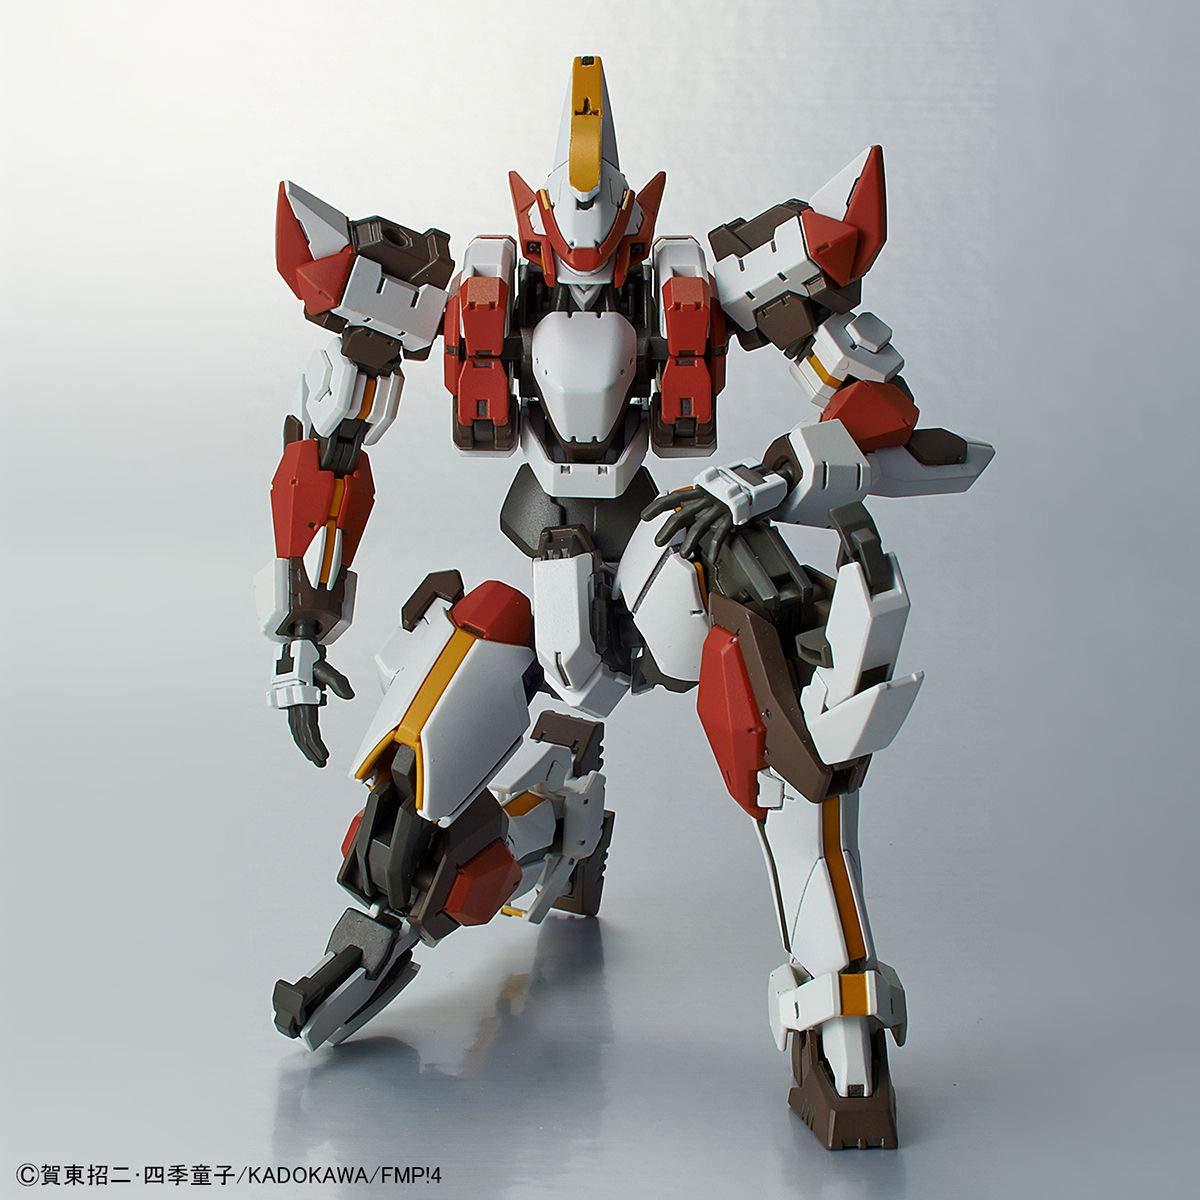 IV 1//60 Scale Model Kit Bandai Hobby Full Metal Panic Arx-8 Laevatein Ver